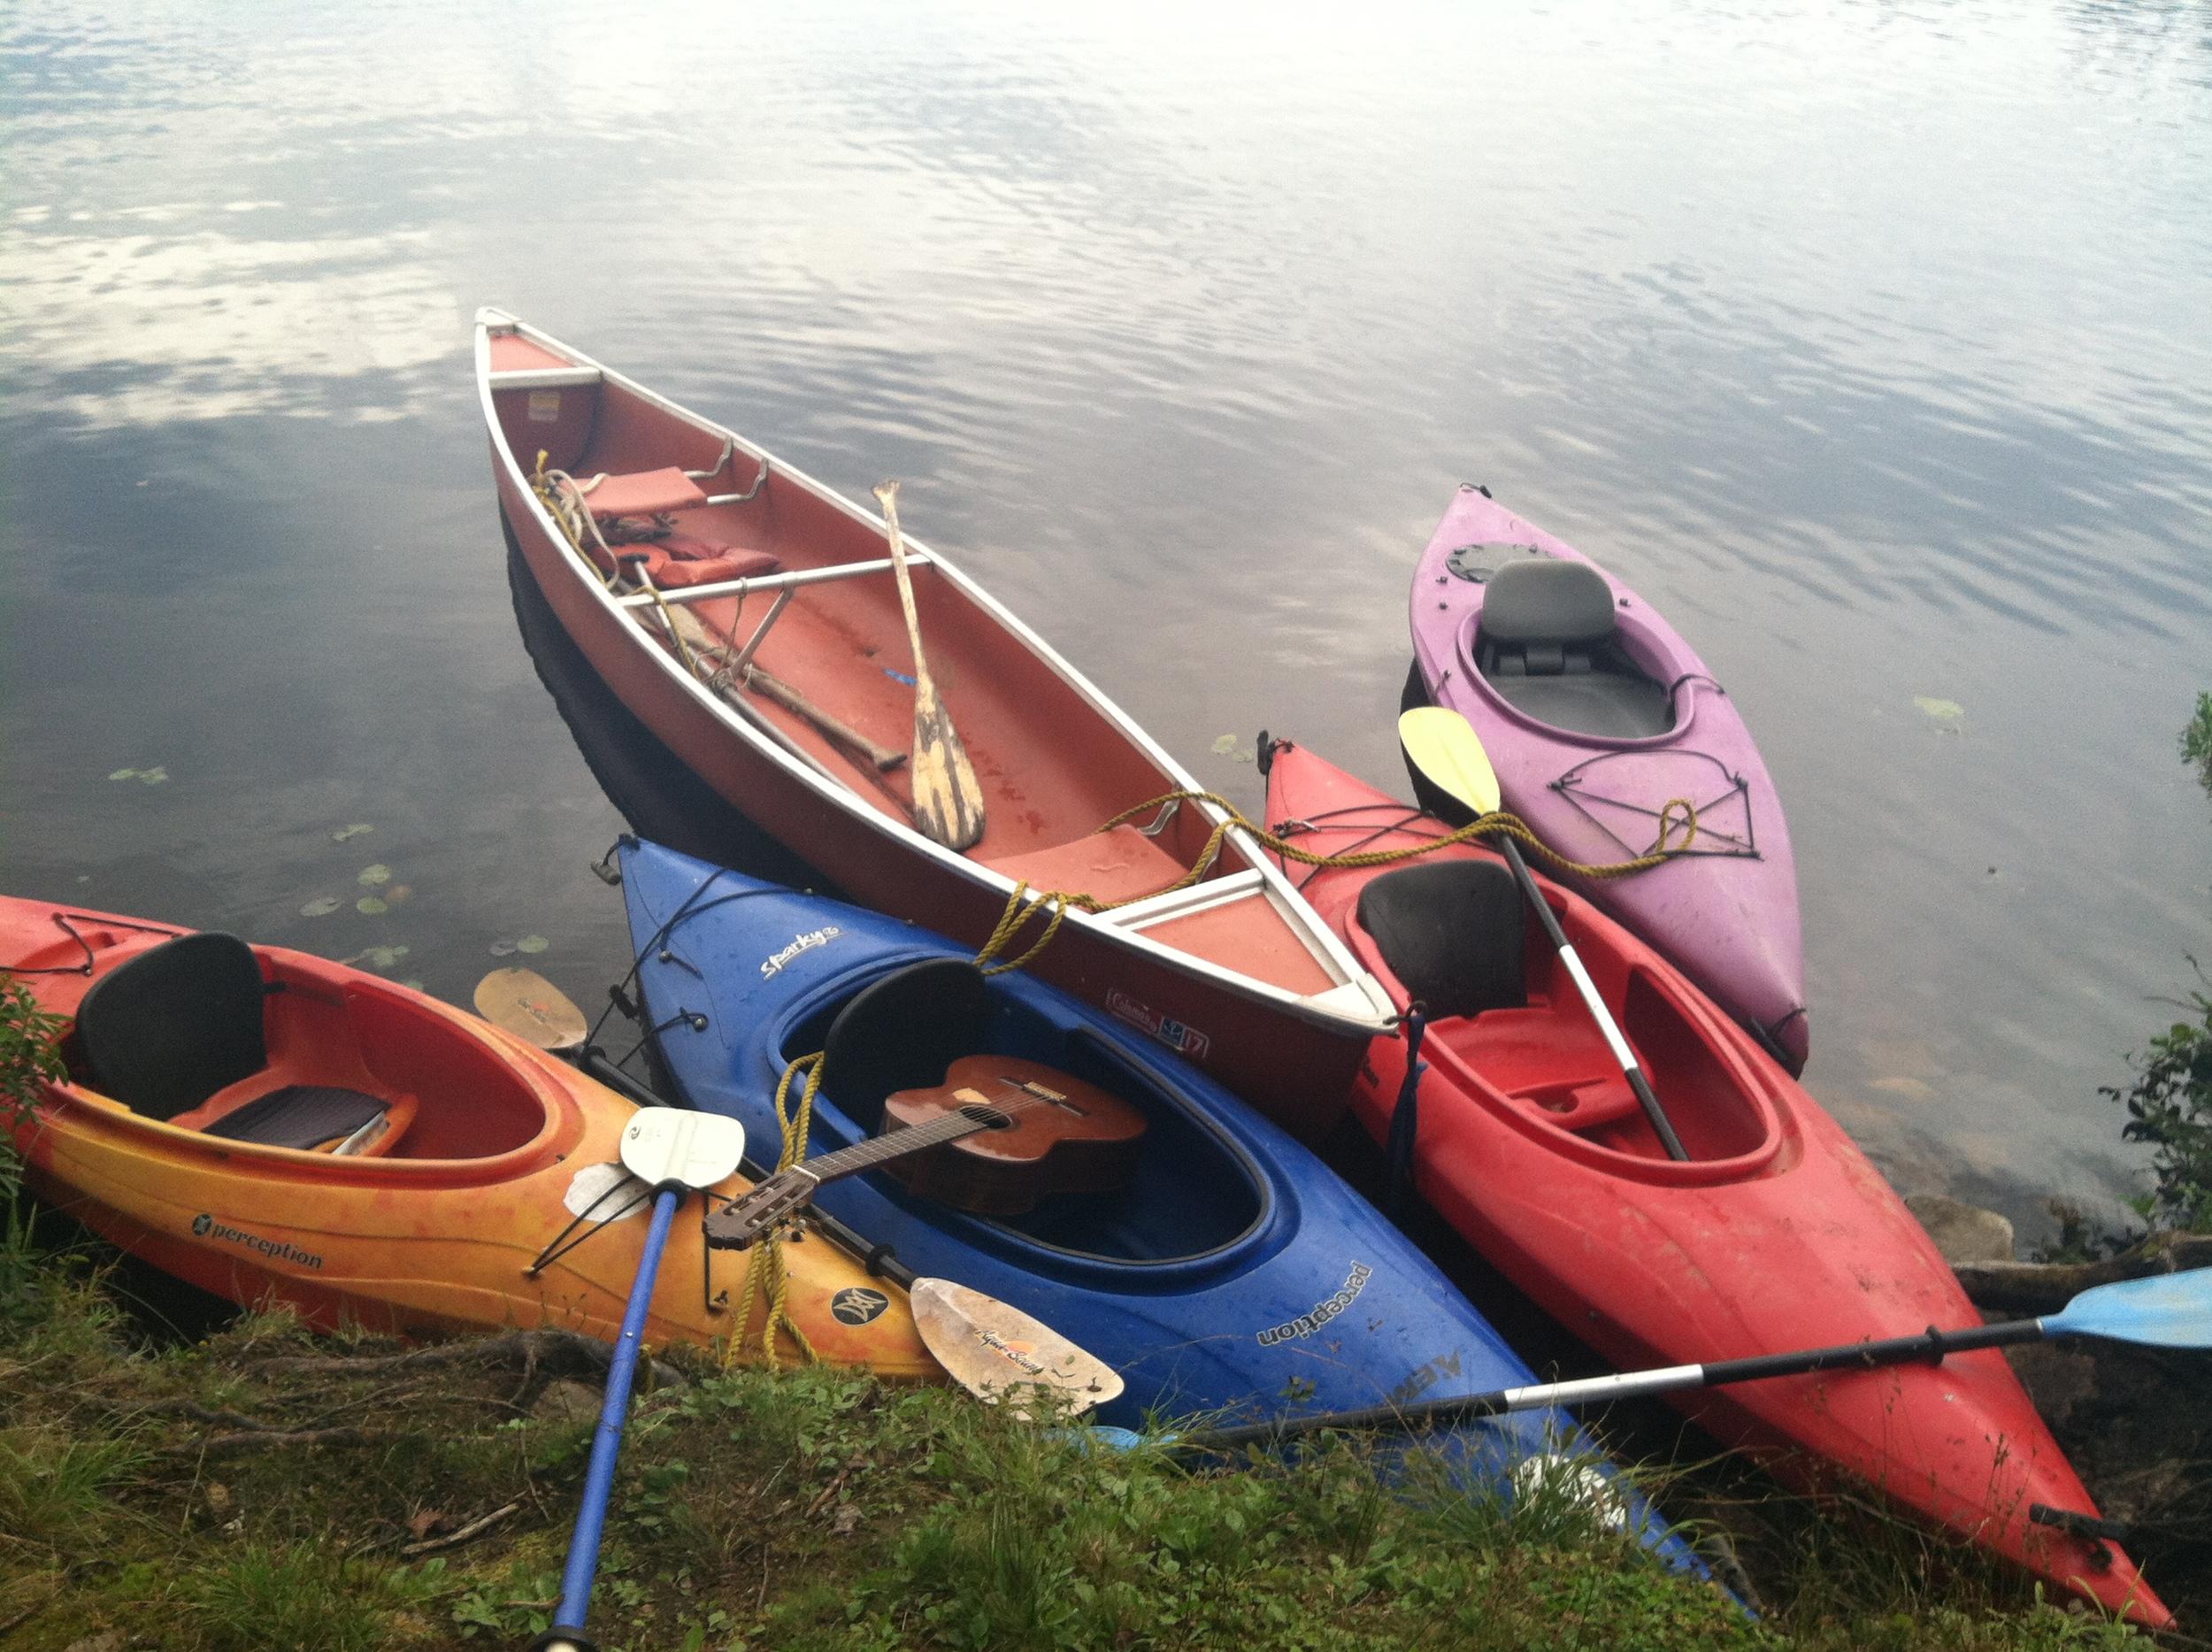 Kayaking in the Battenkill